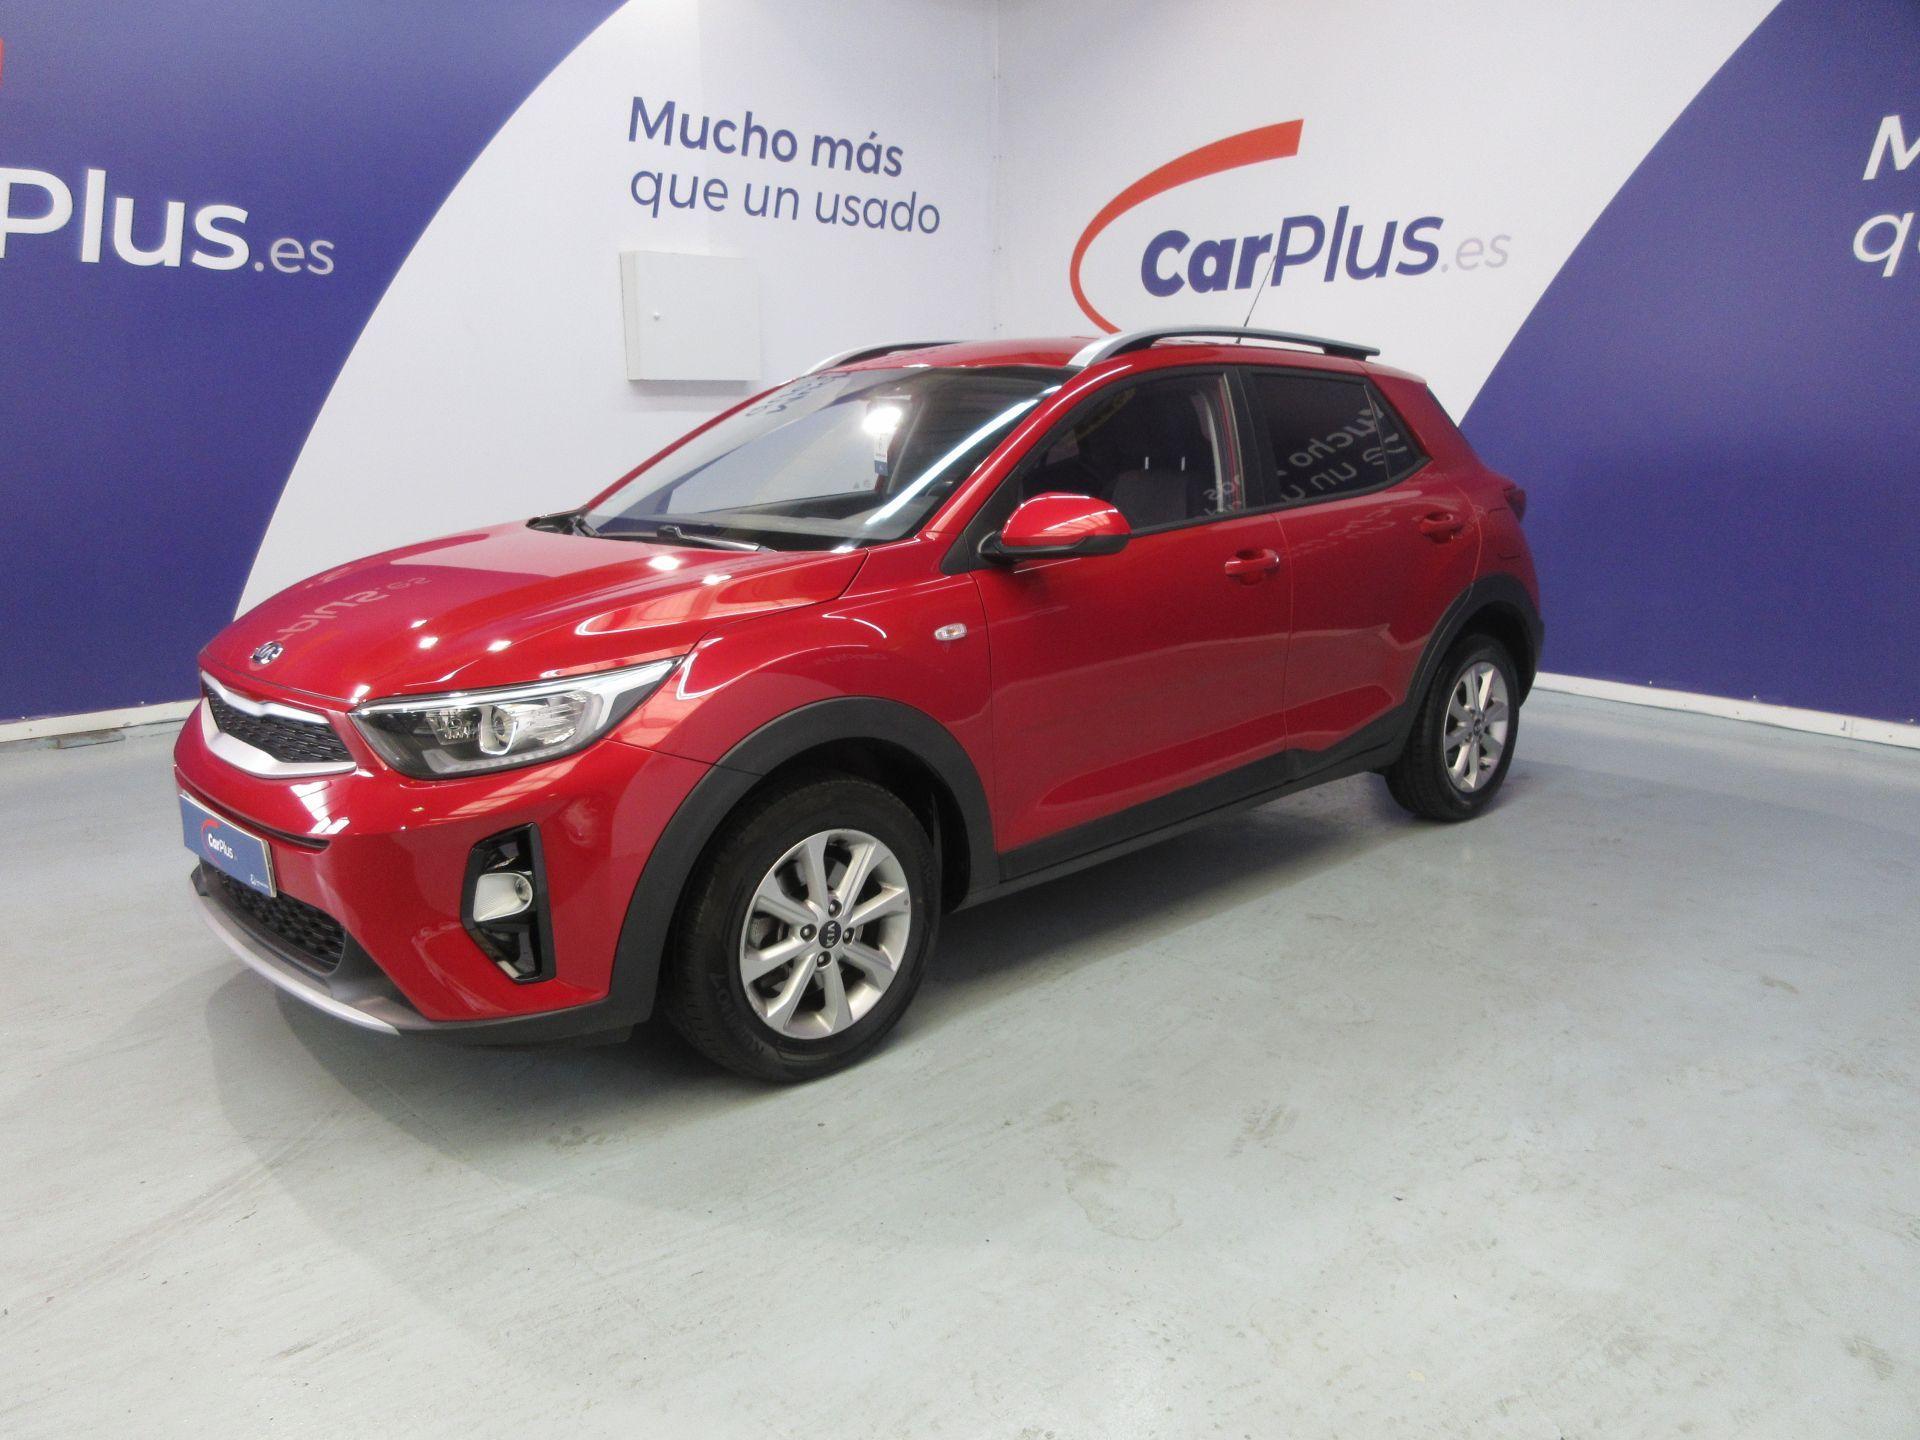 Kia Stonic ocasión segunda mano 2019 Gasolina por 13.990€ en Madrid